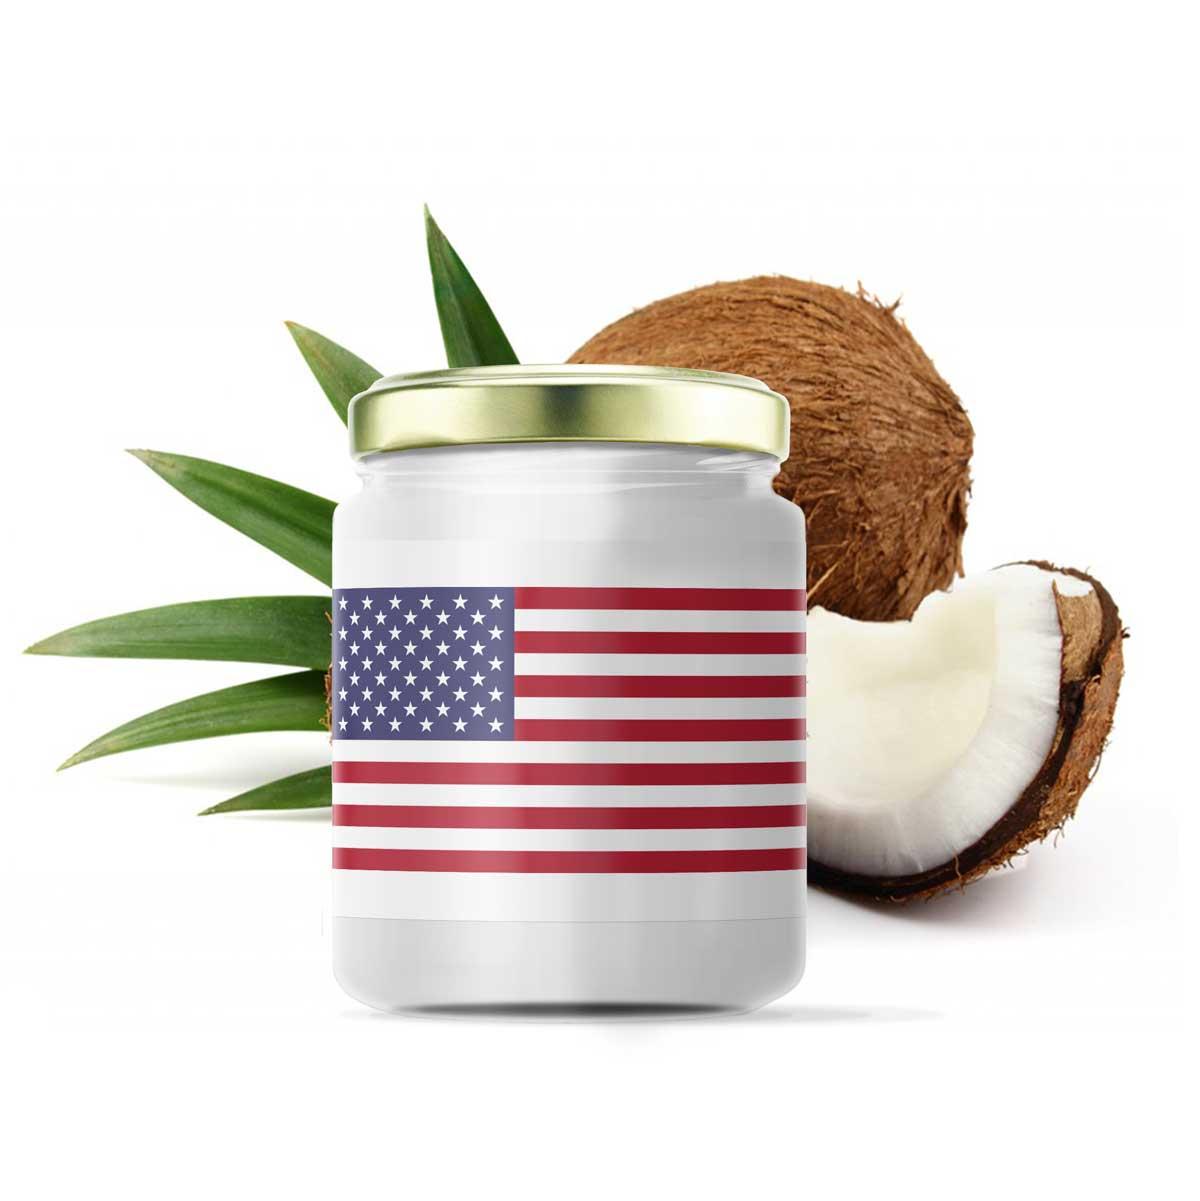 USA Coconut Products jar mockup